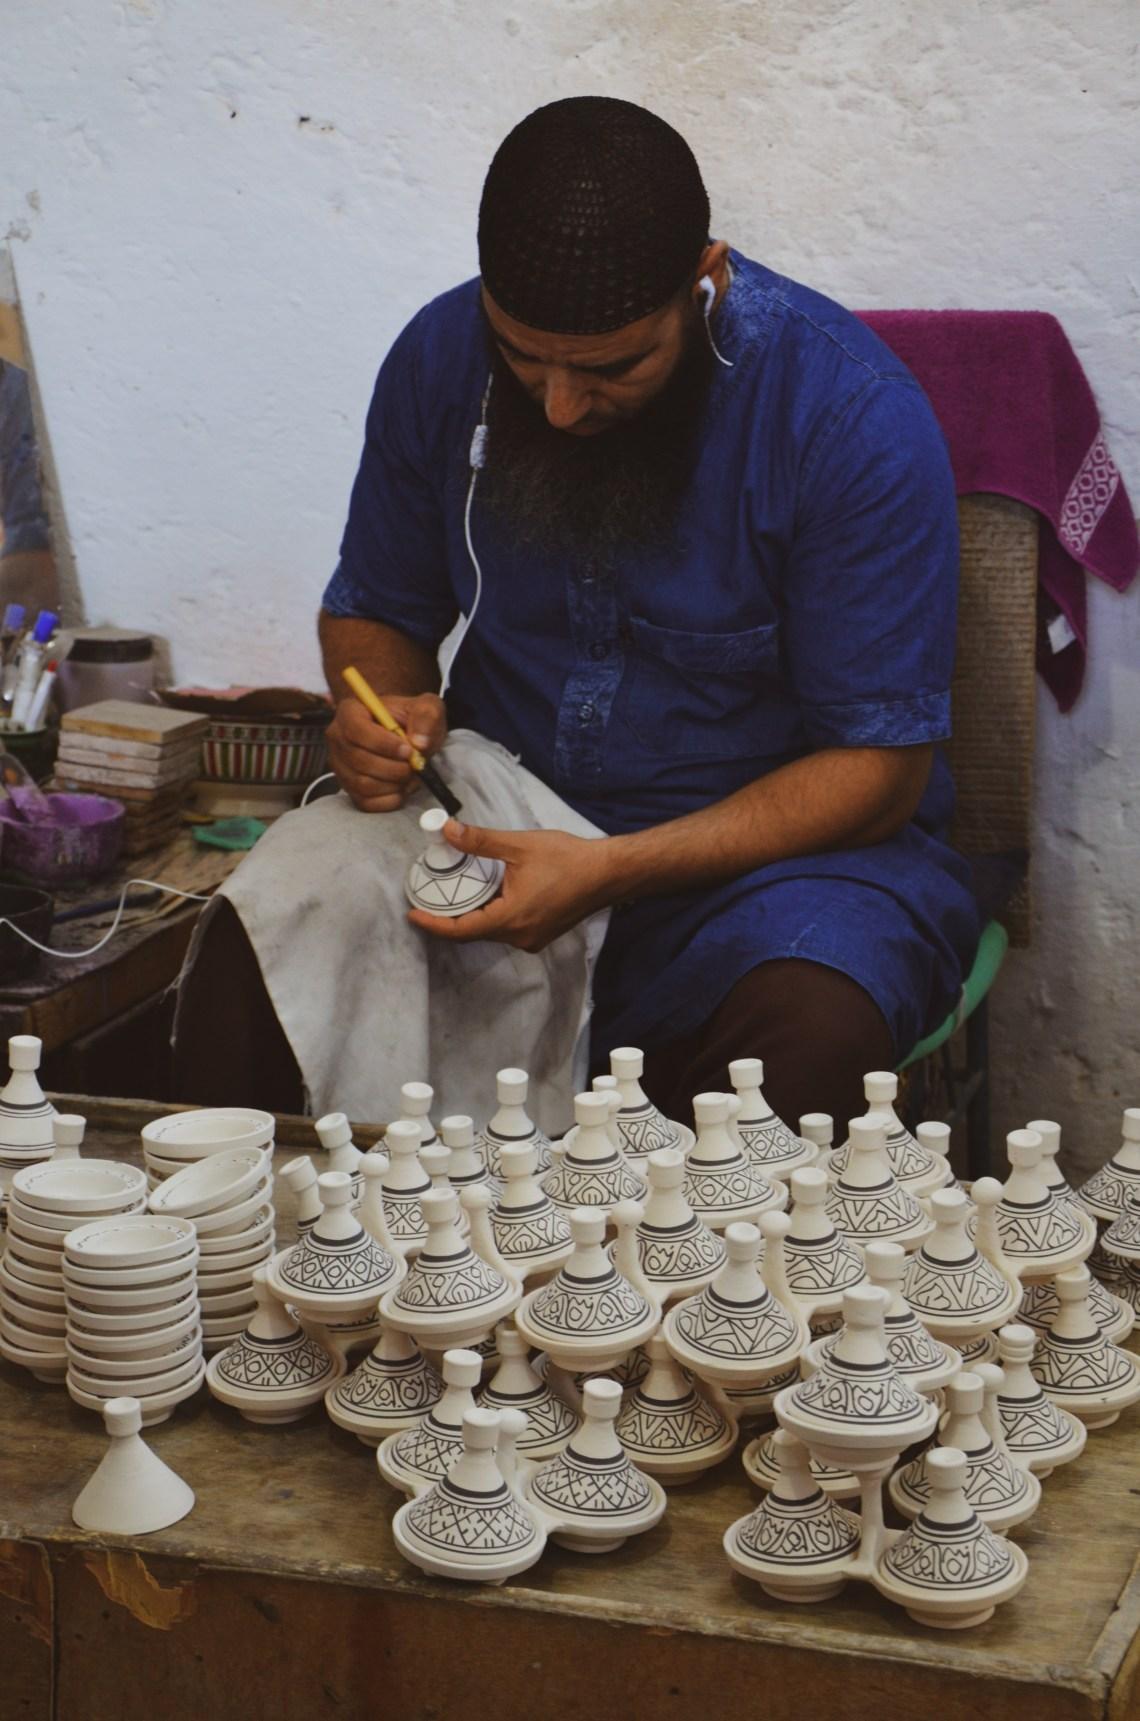 produtos artesanais no Marrocos